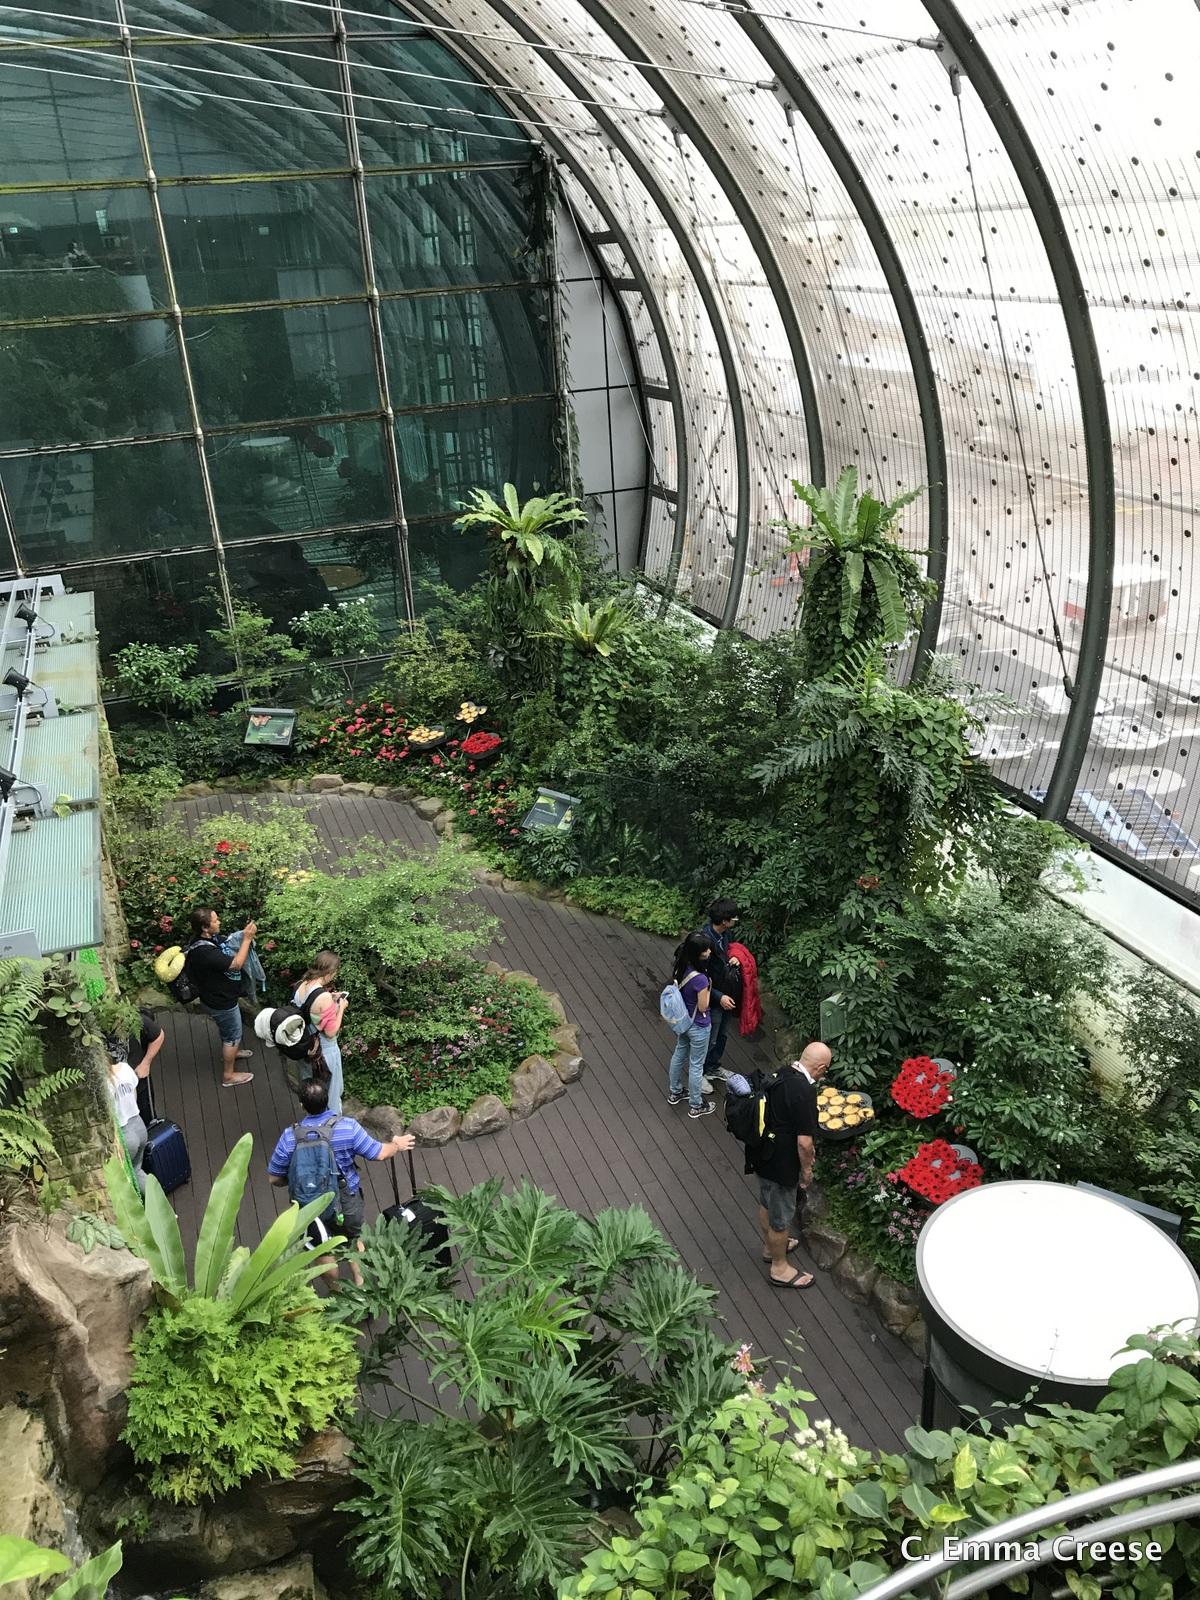 My travel journey – beginning in Singapore #travellinkup